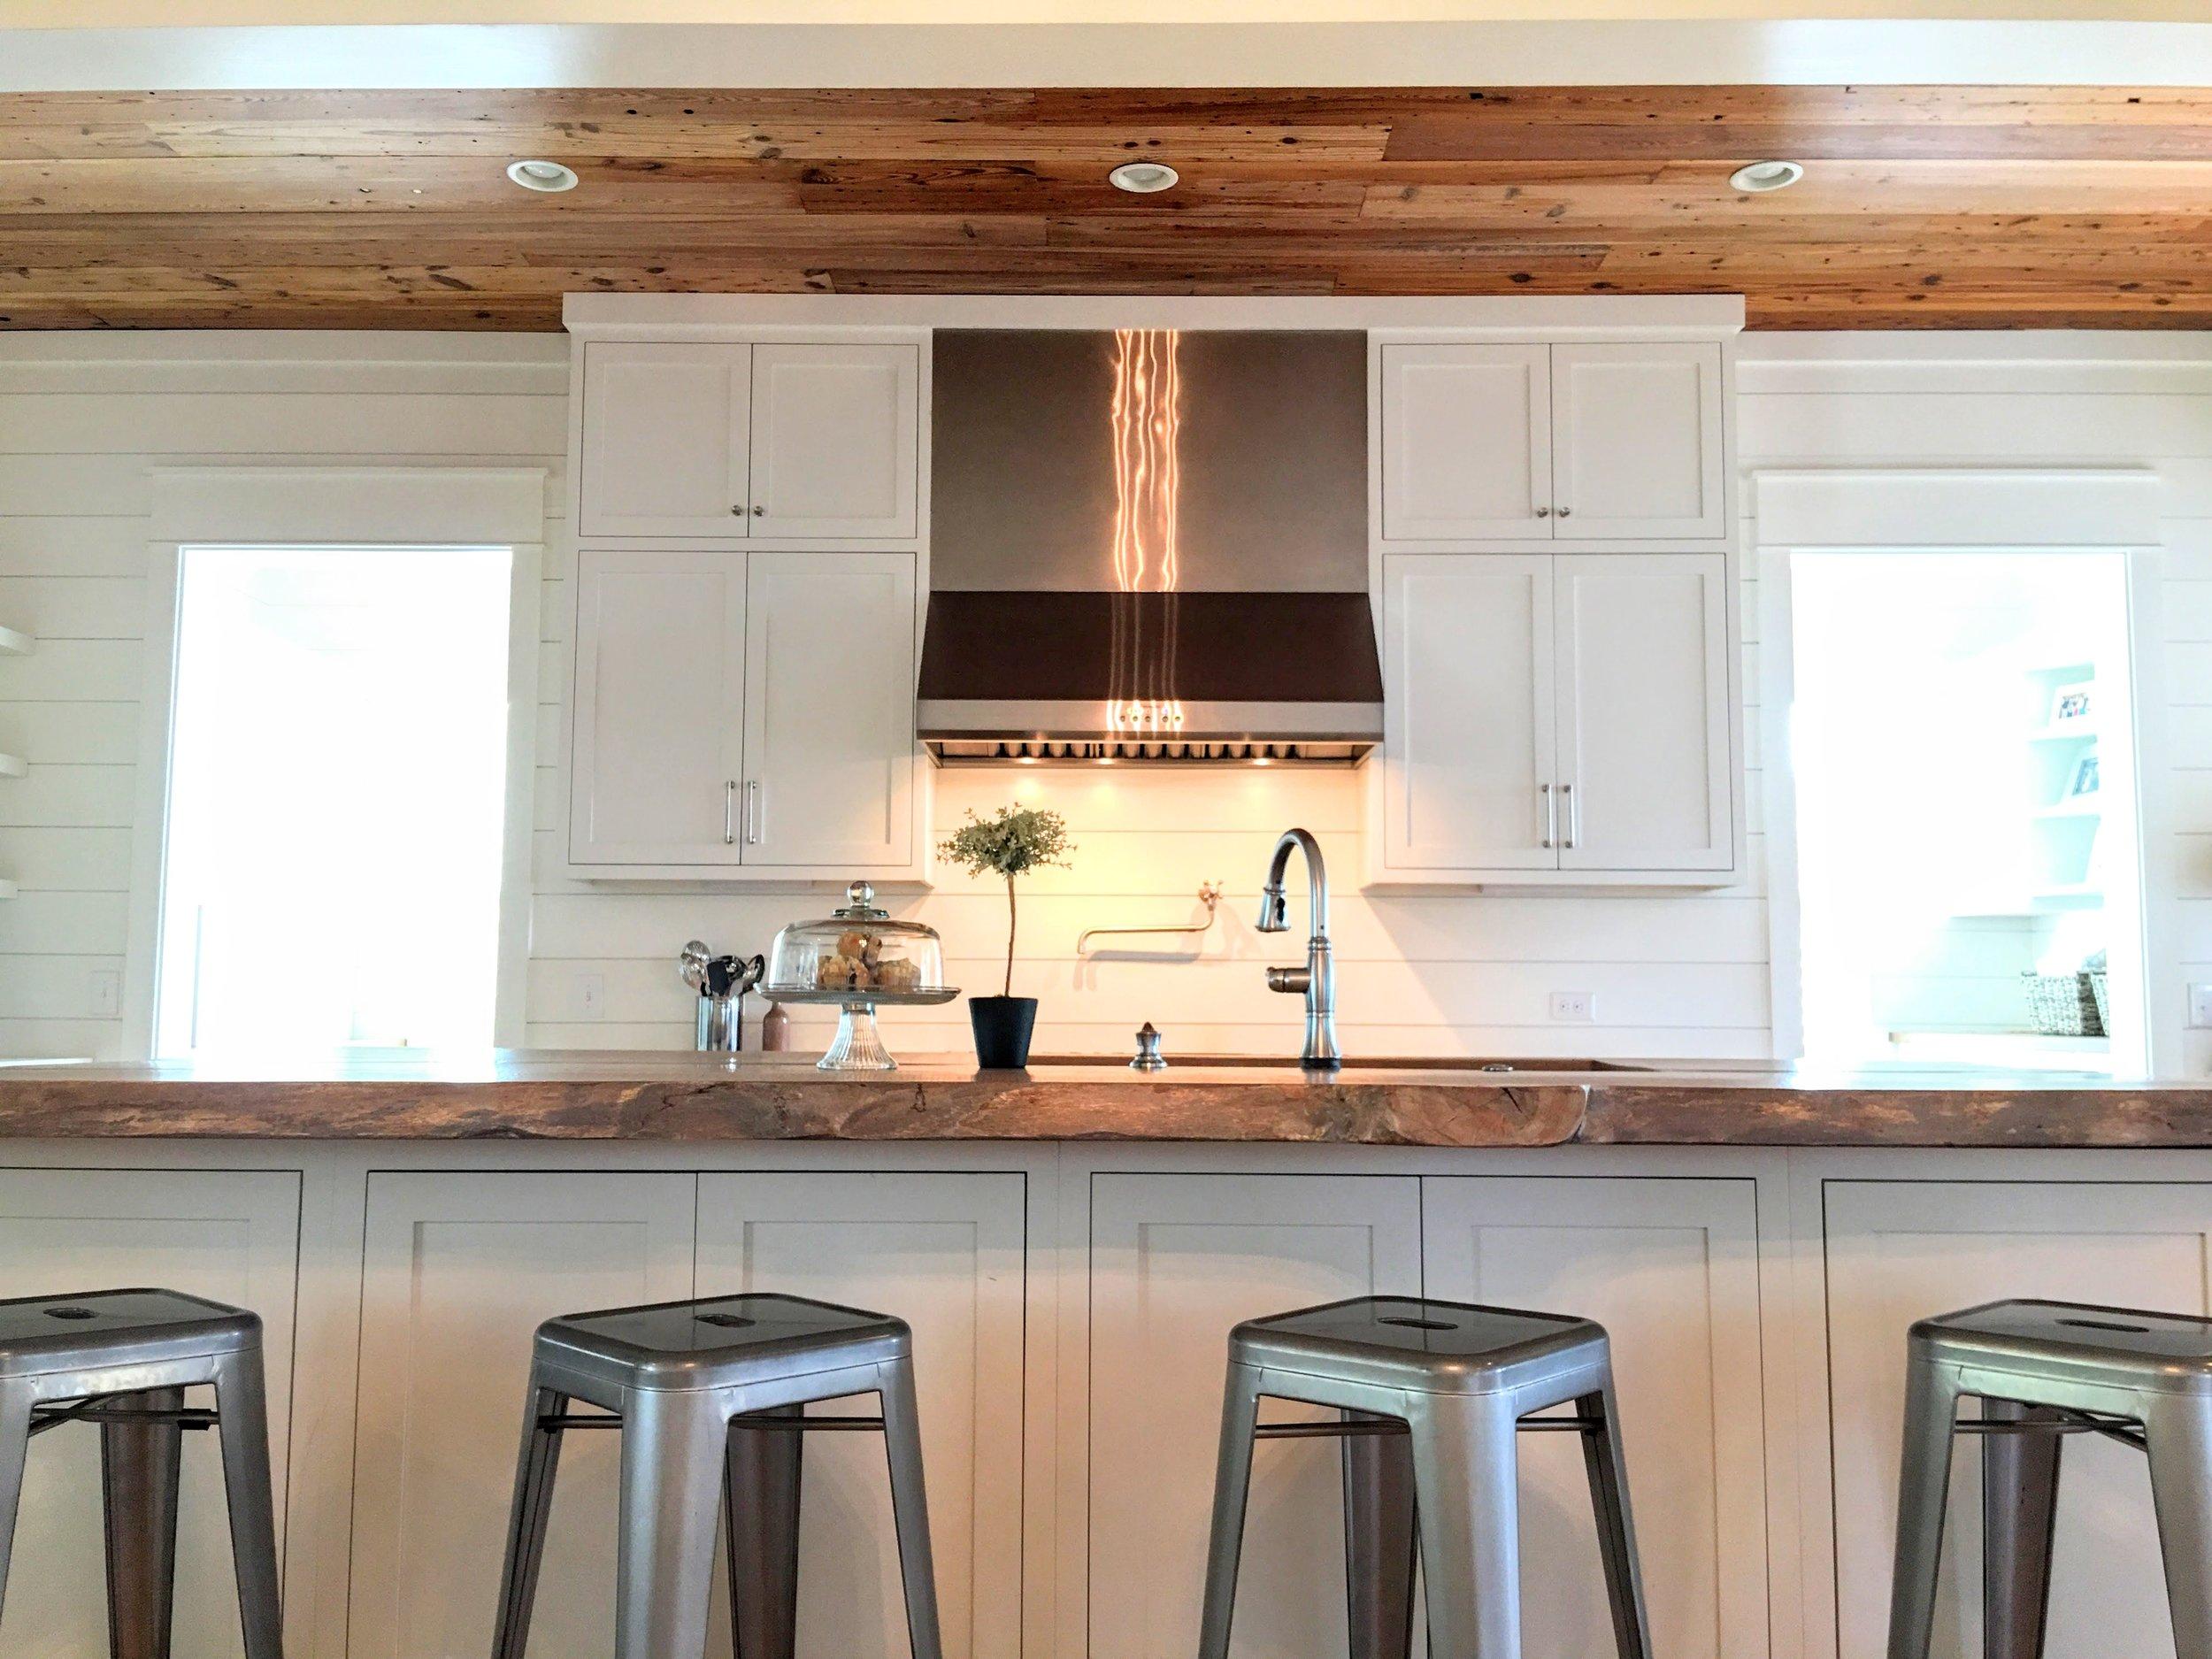 Live Edge Oak kitchen island and reclaimed heart pine ceiling trim